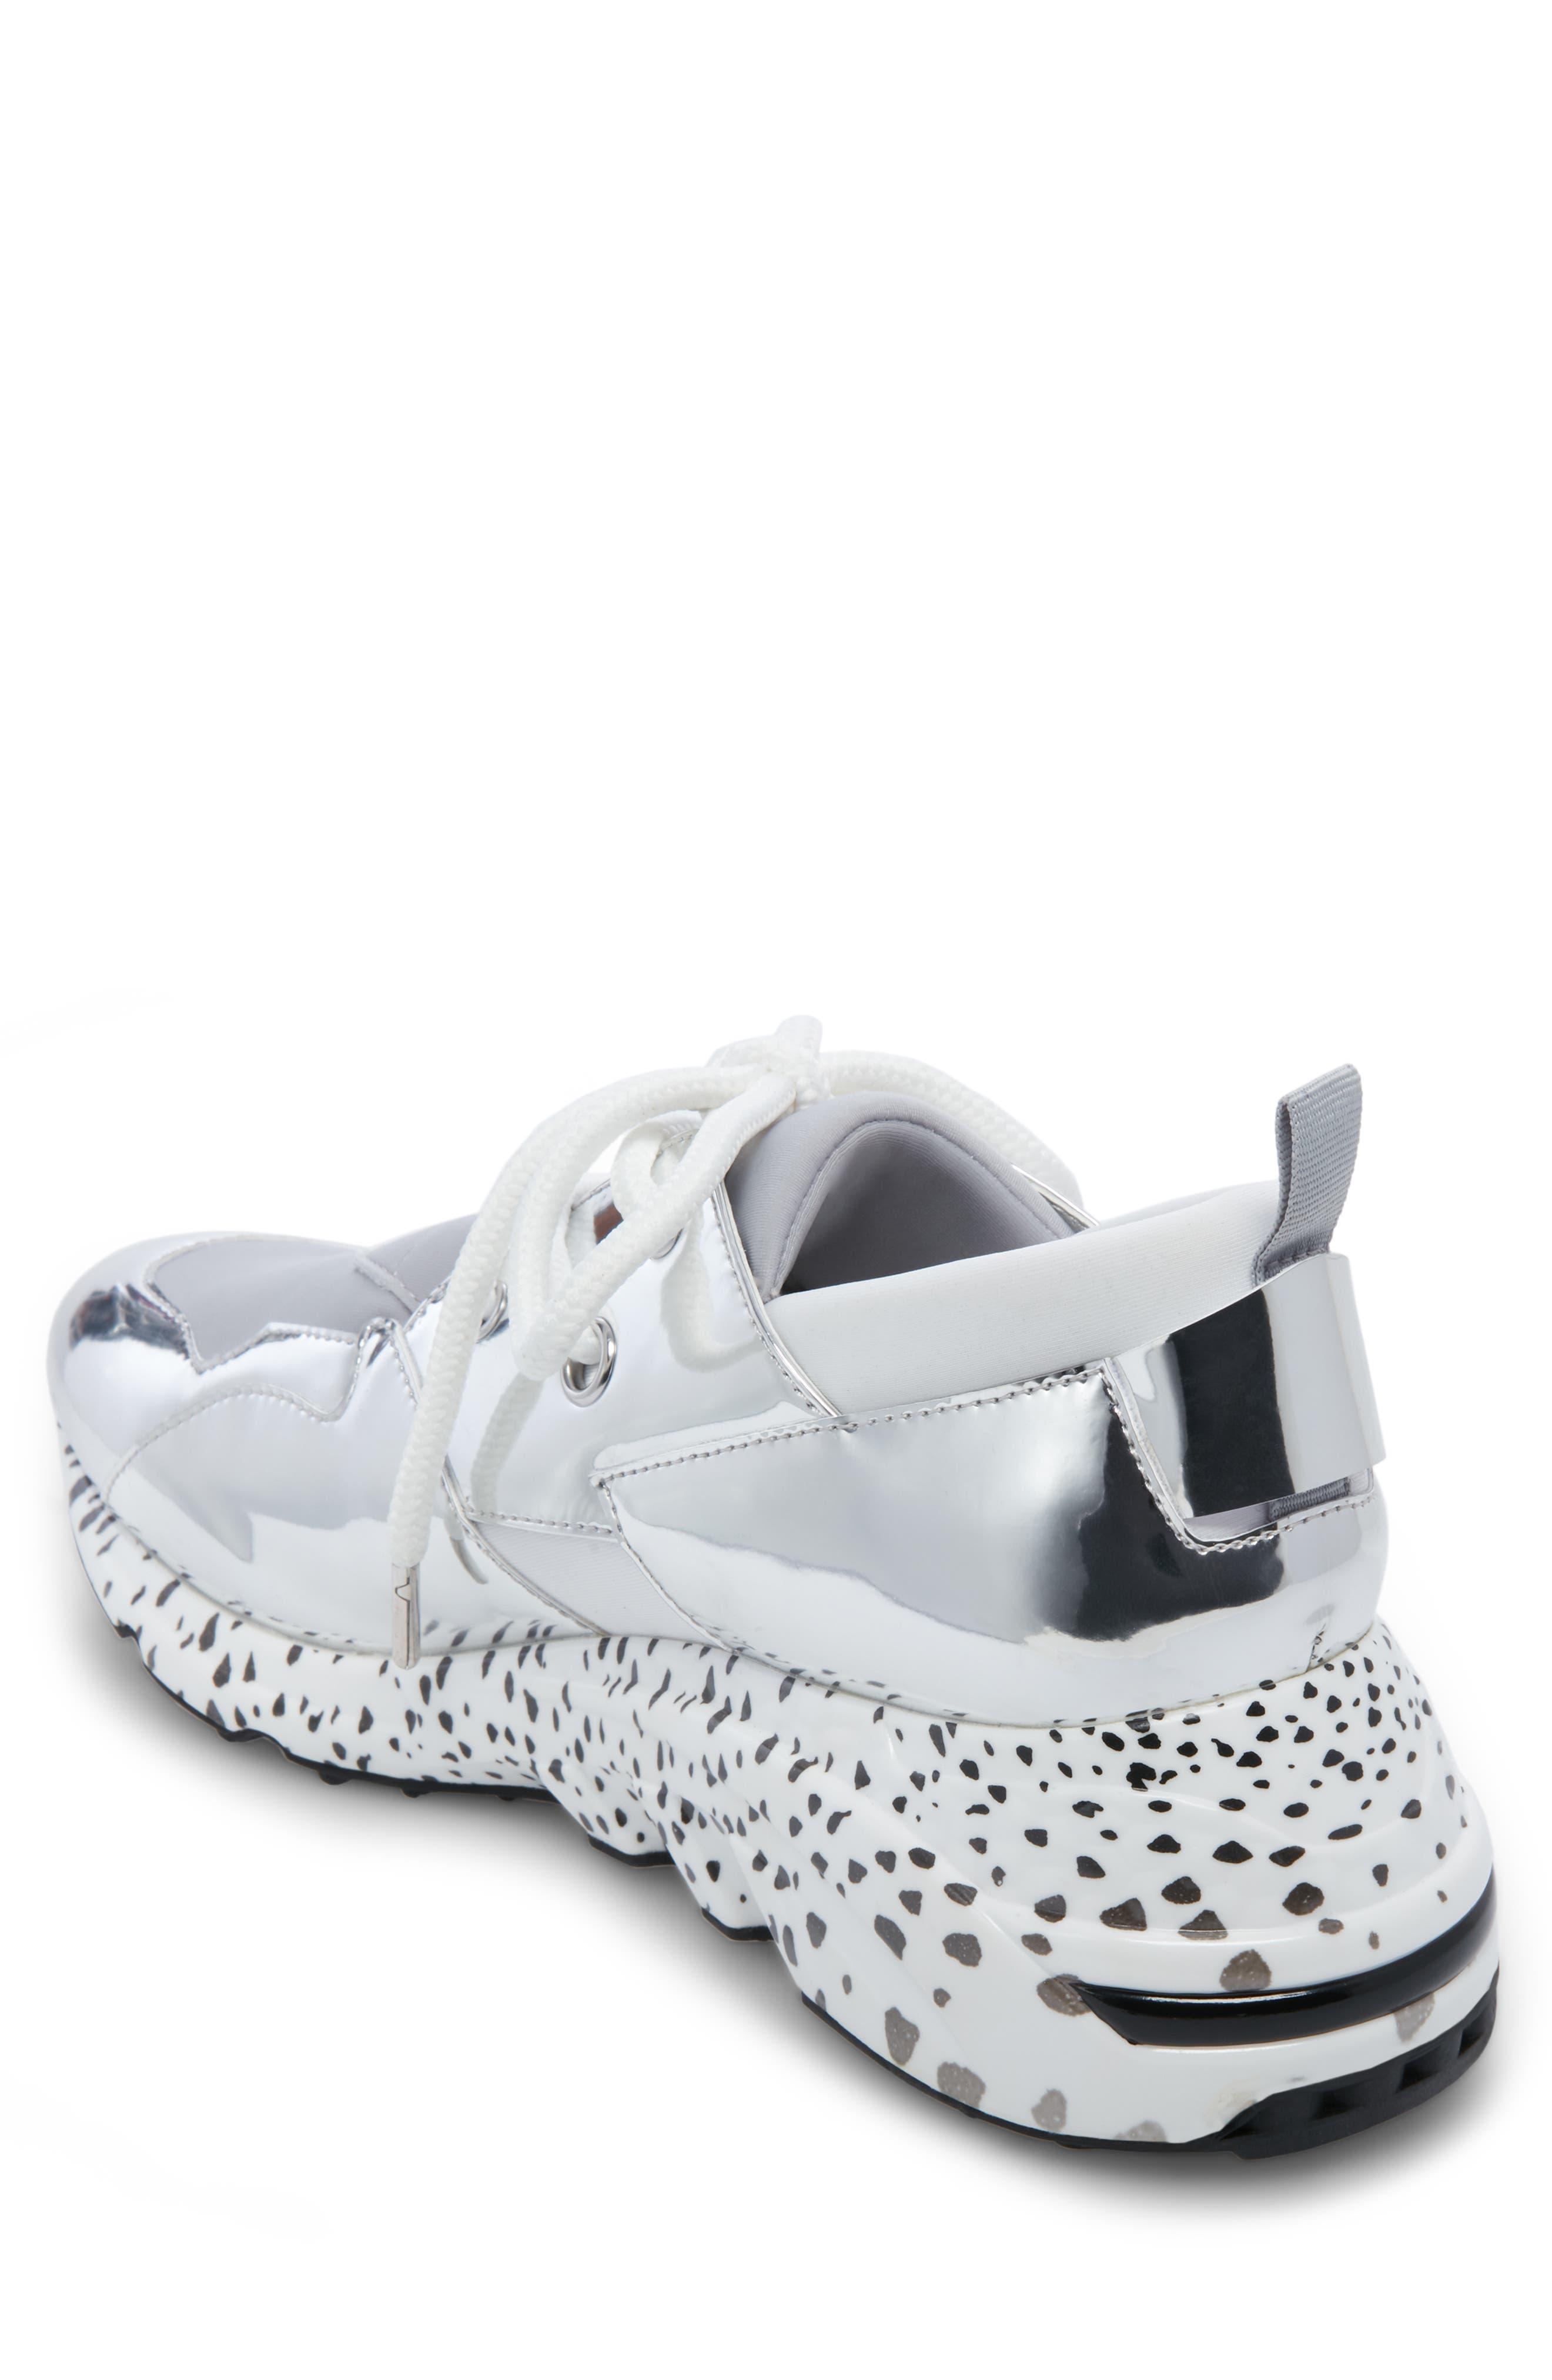 Ridge Sneaker,                             Alternate thumbnail 2, color,                             SILVER MULTI